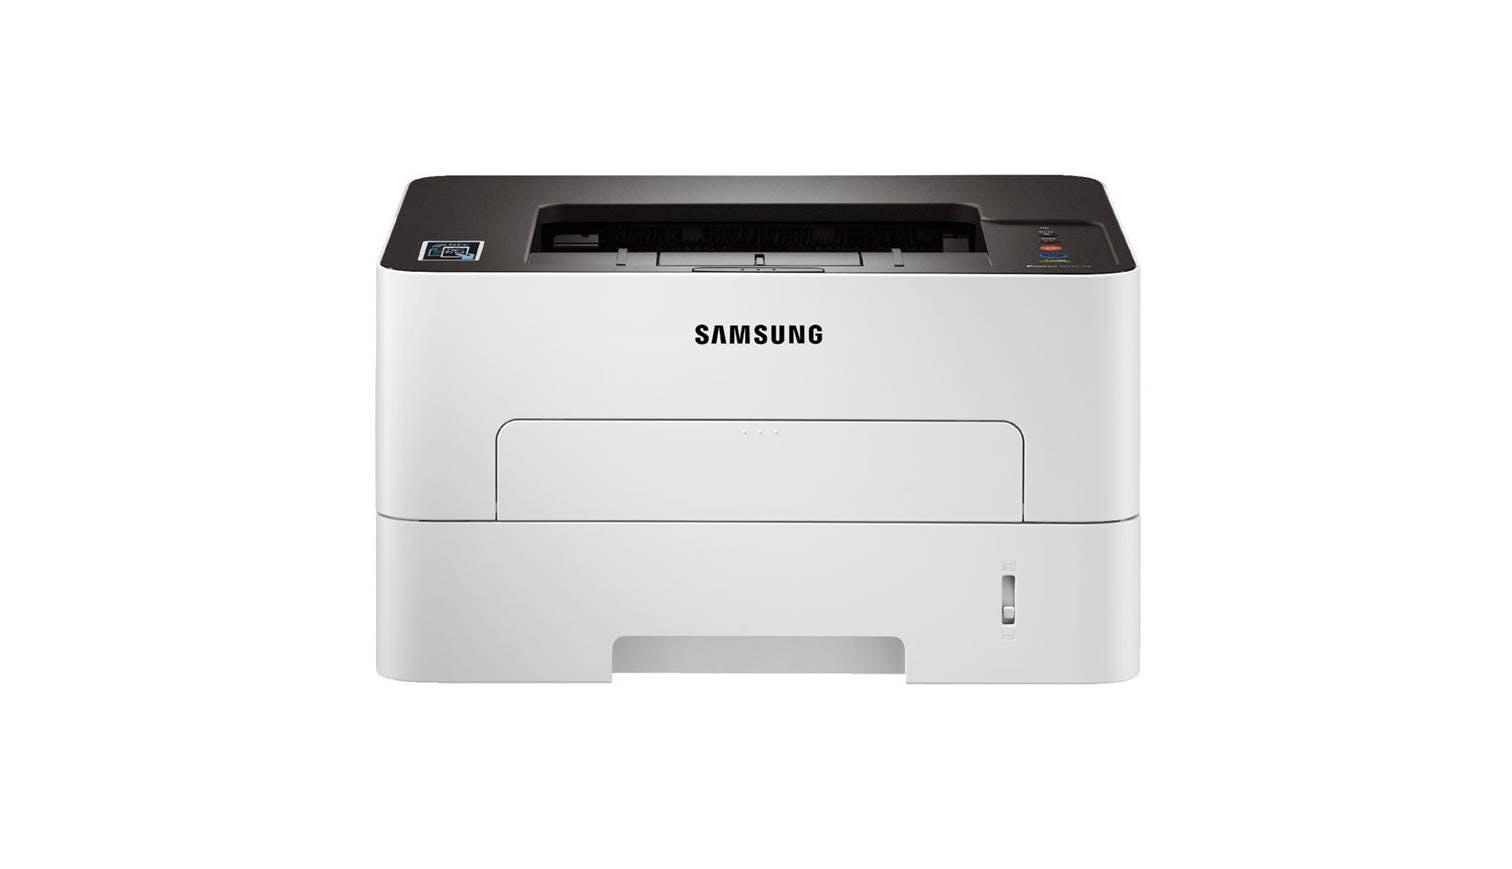 Samsung SL M2835DW Laser Printer